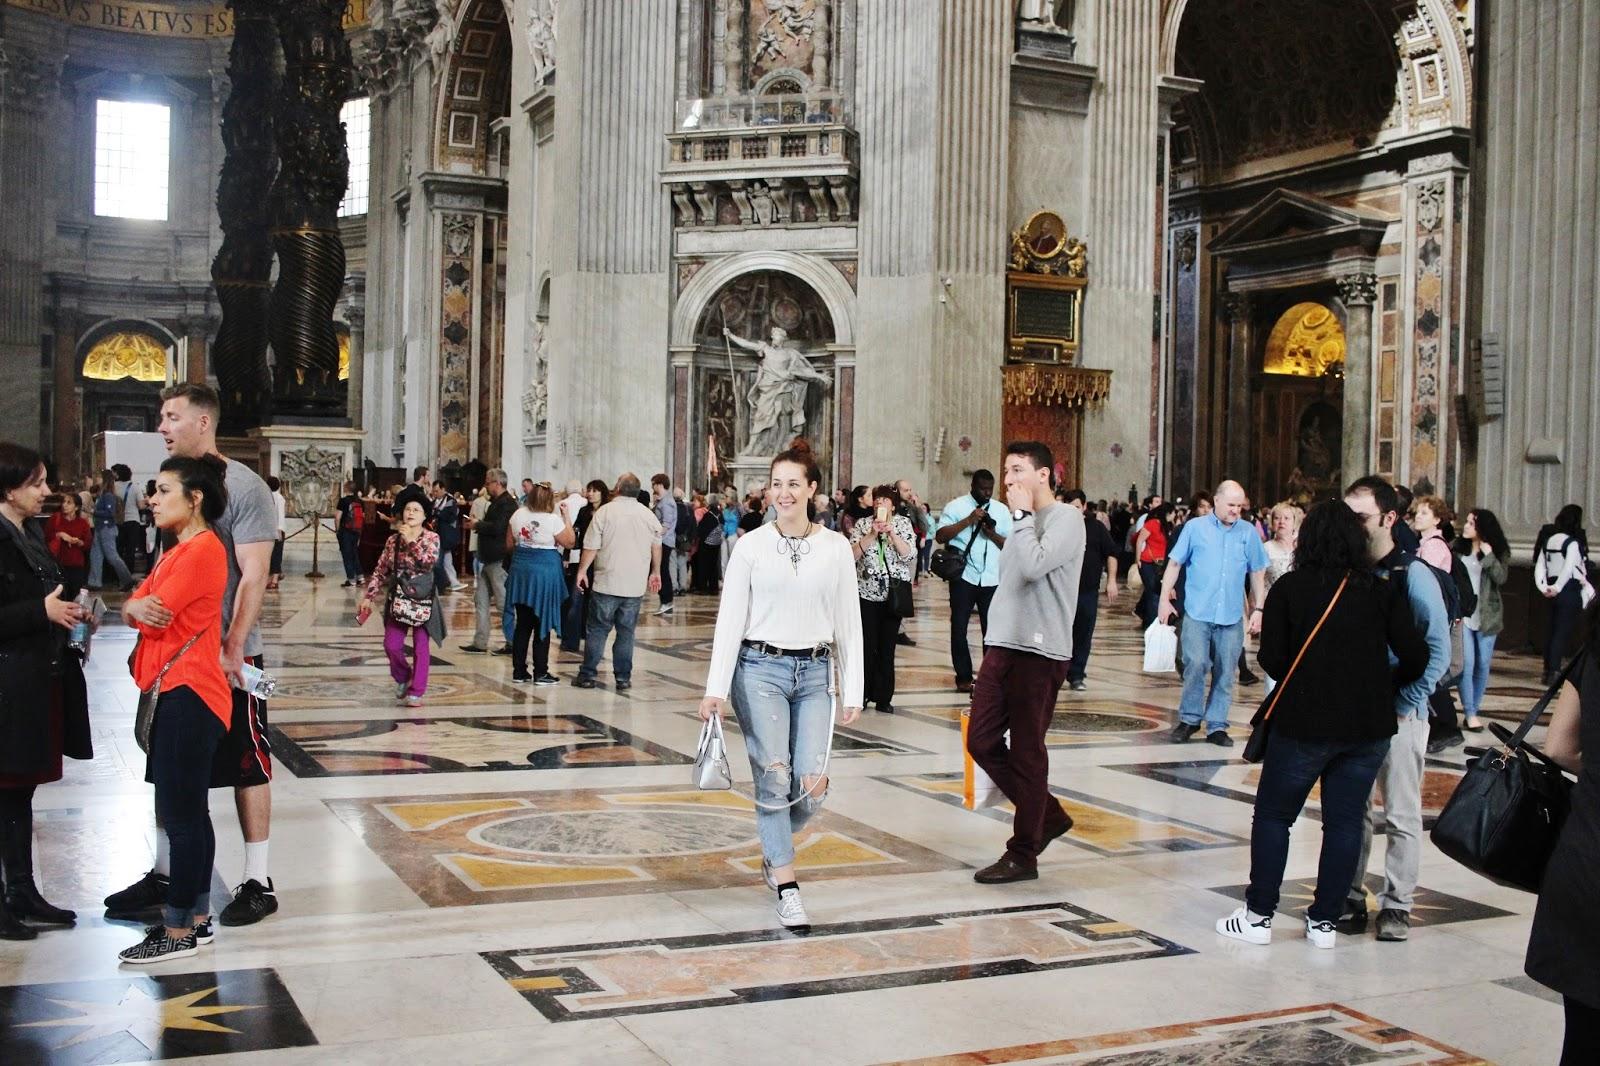 basílica de san Pedro por dentro